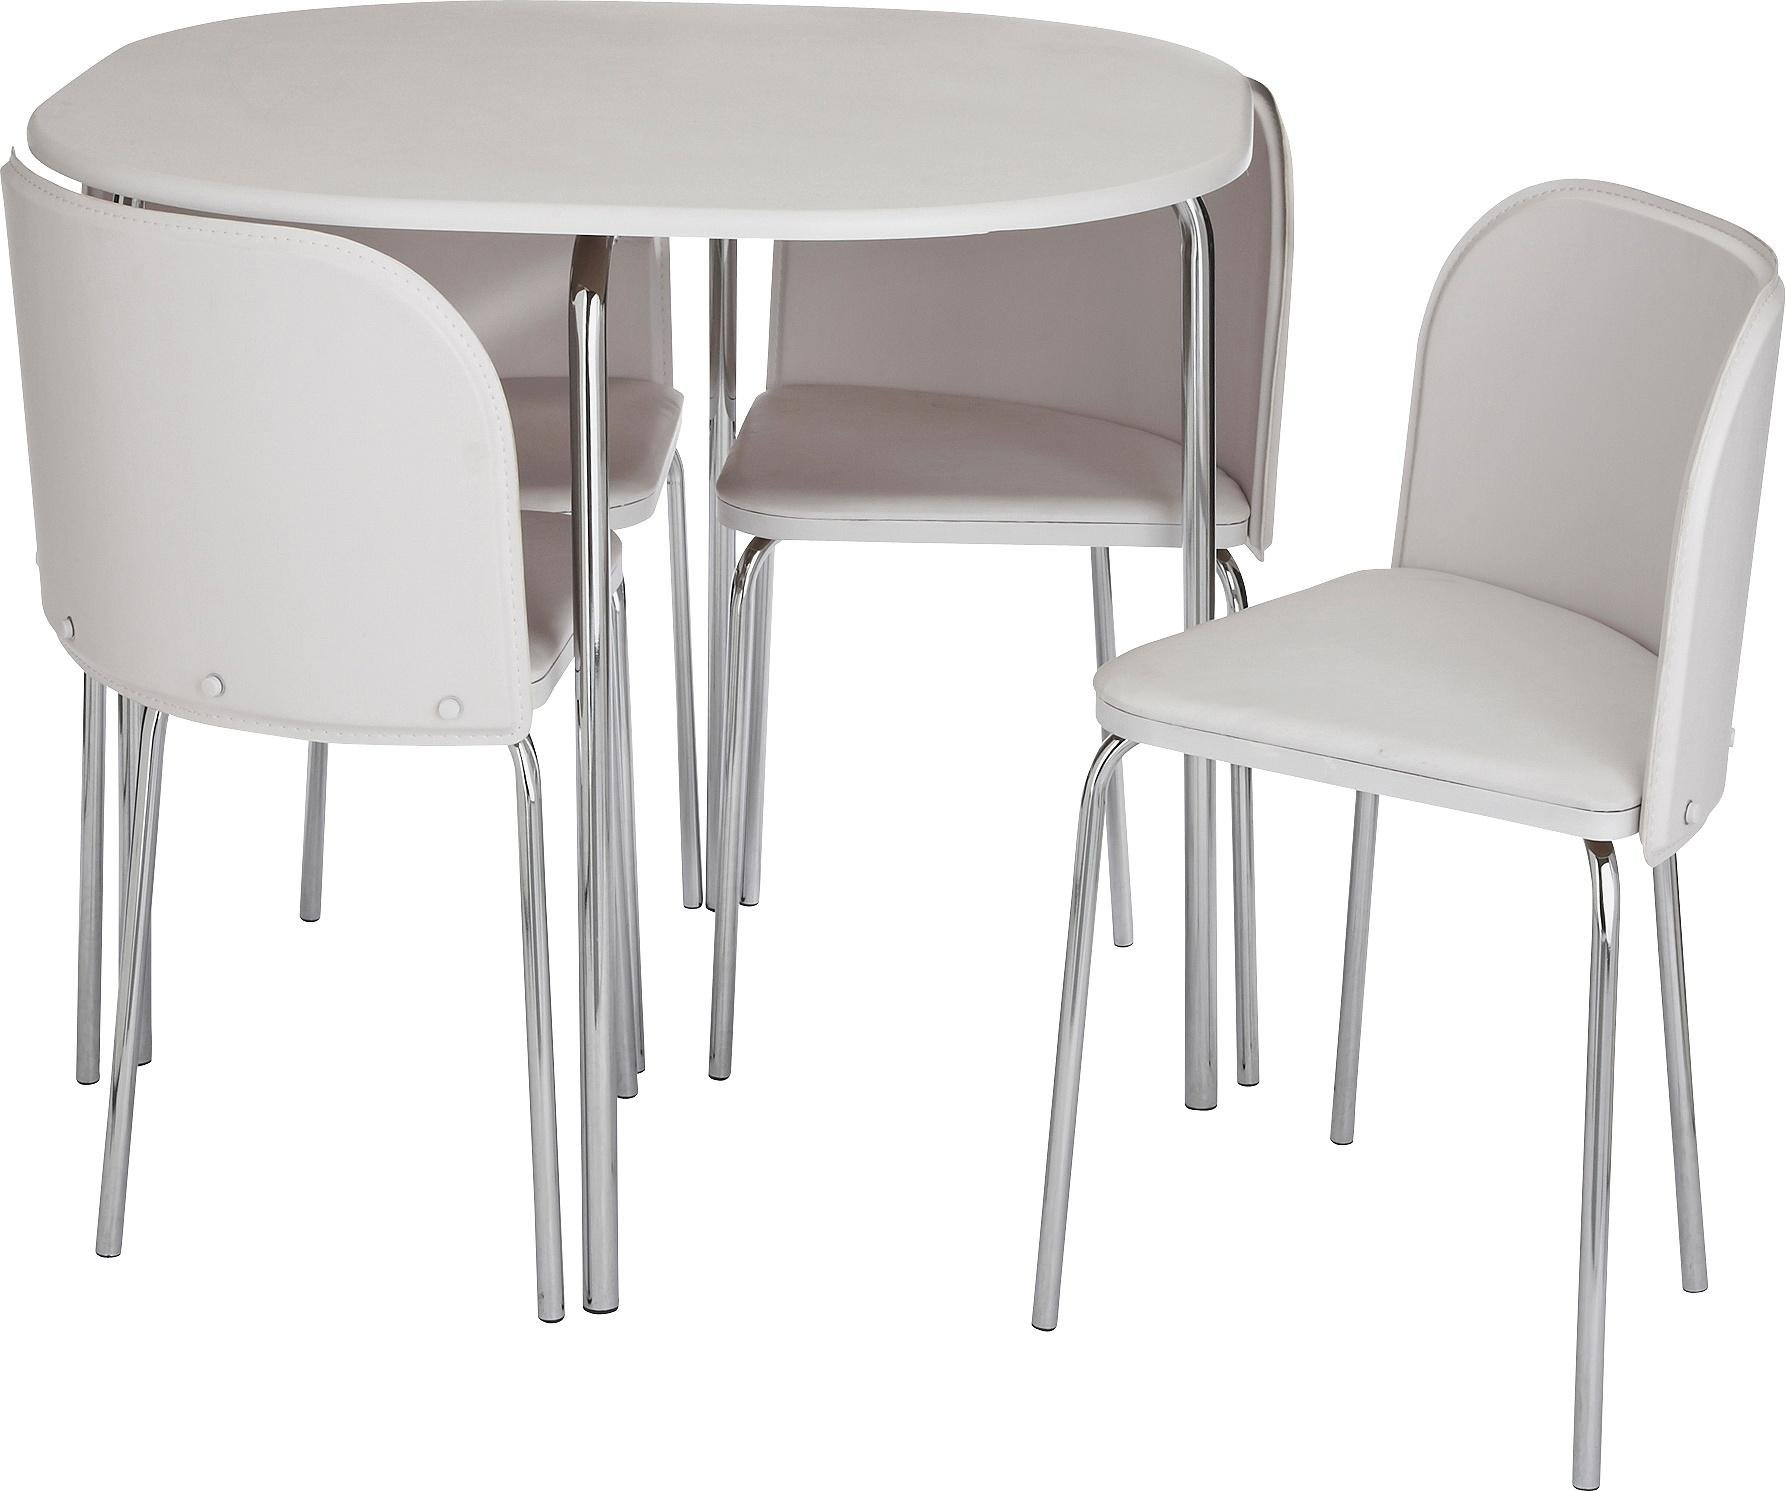 Argos Home Amparo Dining Table & 4 Chairs - White